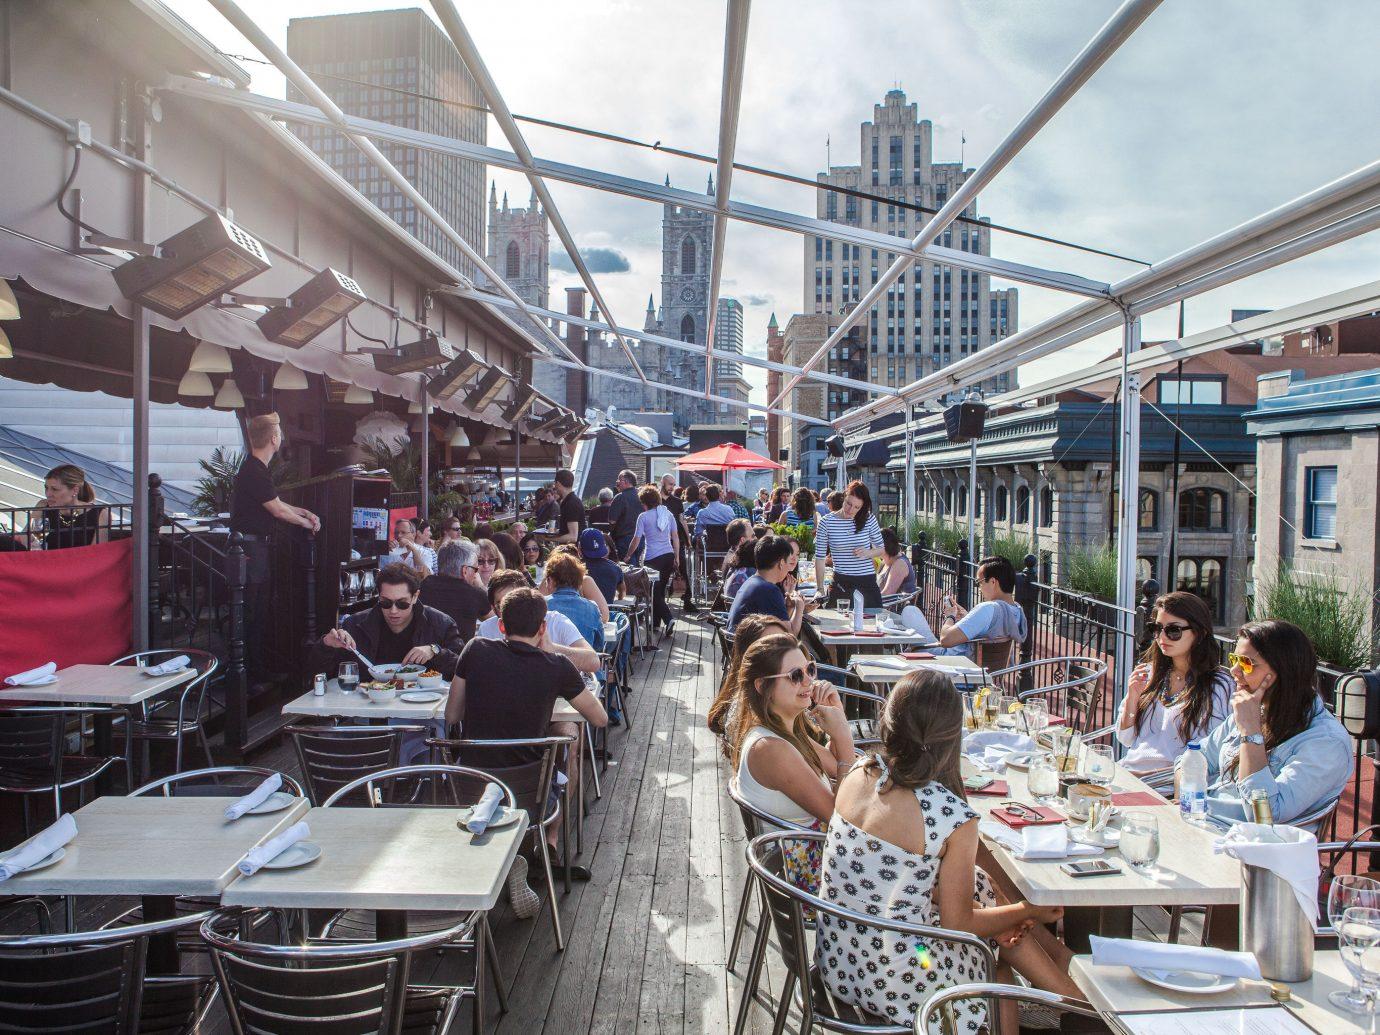 Trip Ideas building outdoor restaurant people City crowd